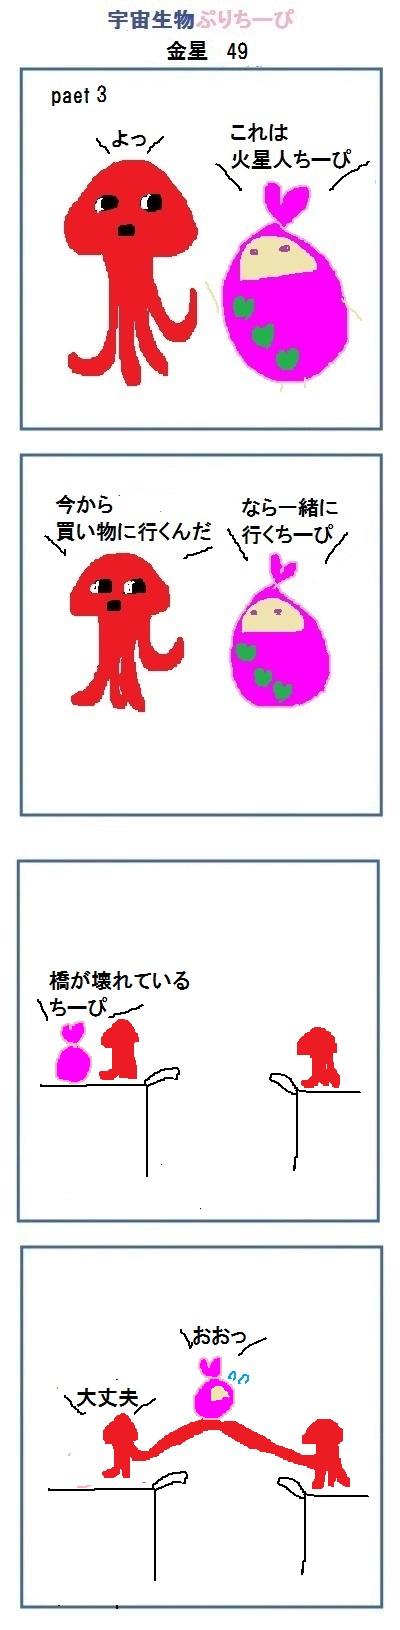 160722_kinsei49.jpg